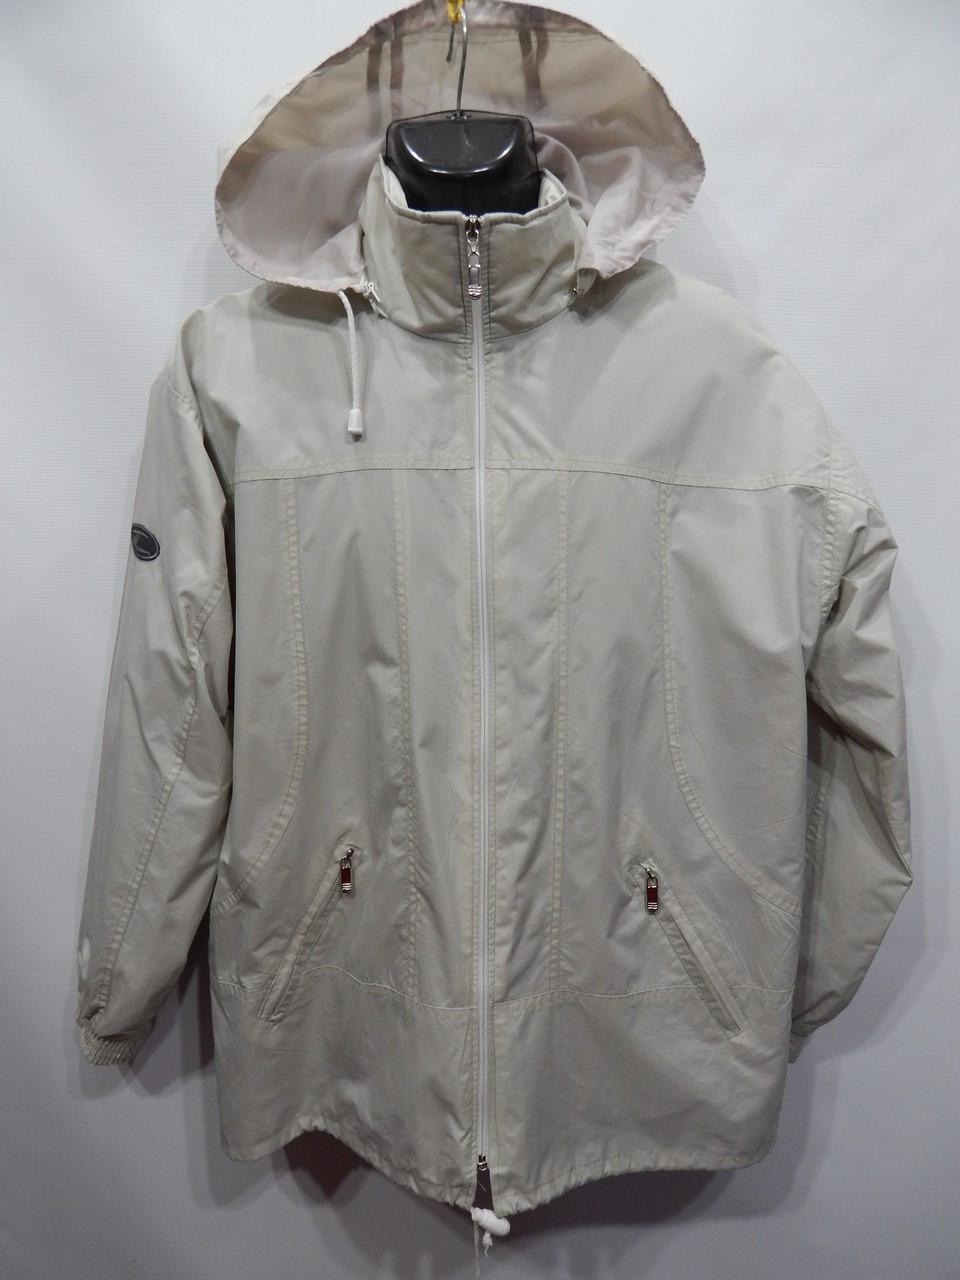 Мужская спортивная куртка  весна-осень Traffic р.50 034KMD